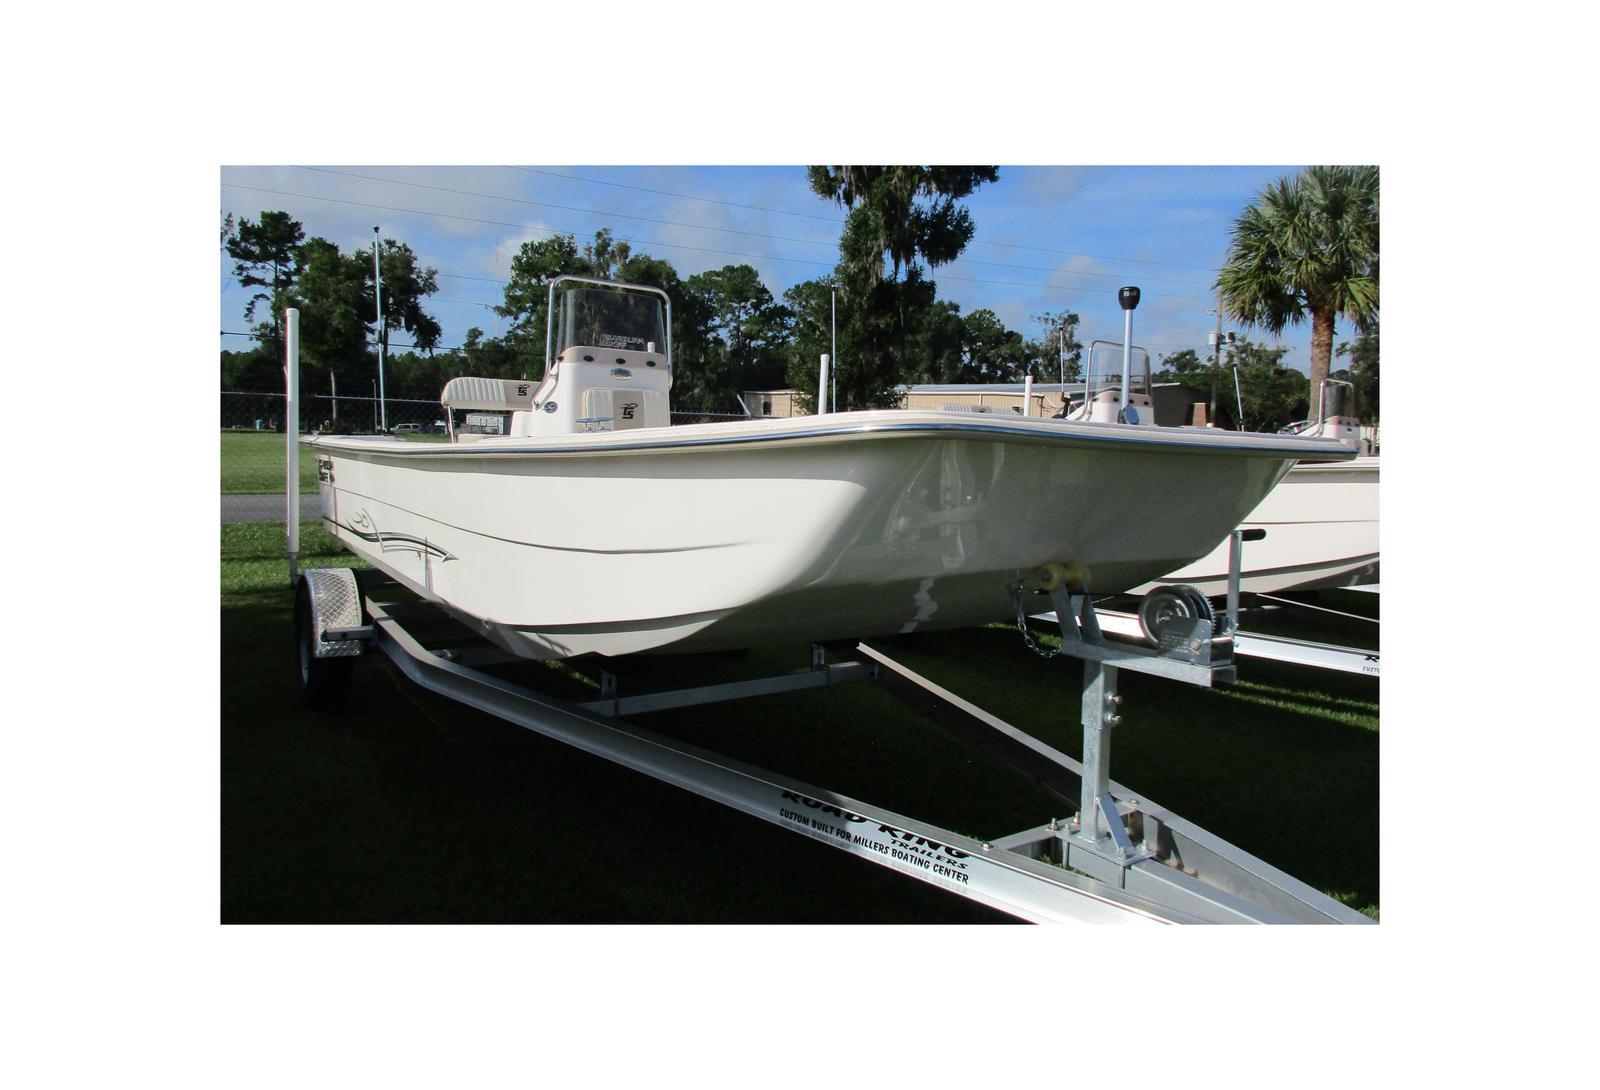 2019 Carolina Skiff 2180 DLX for sale in Ocala, FL | Millers Boating Center  (877) 898-1474